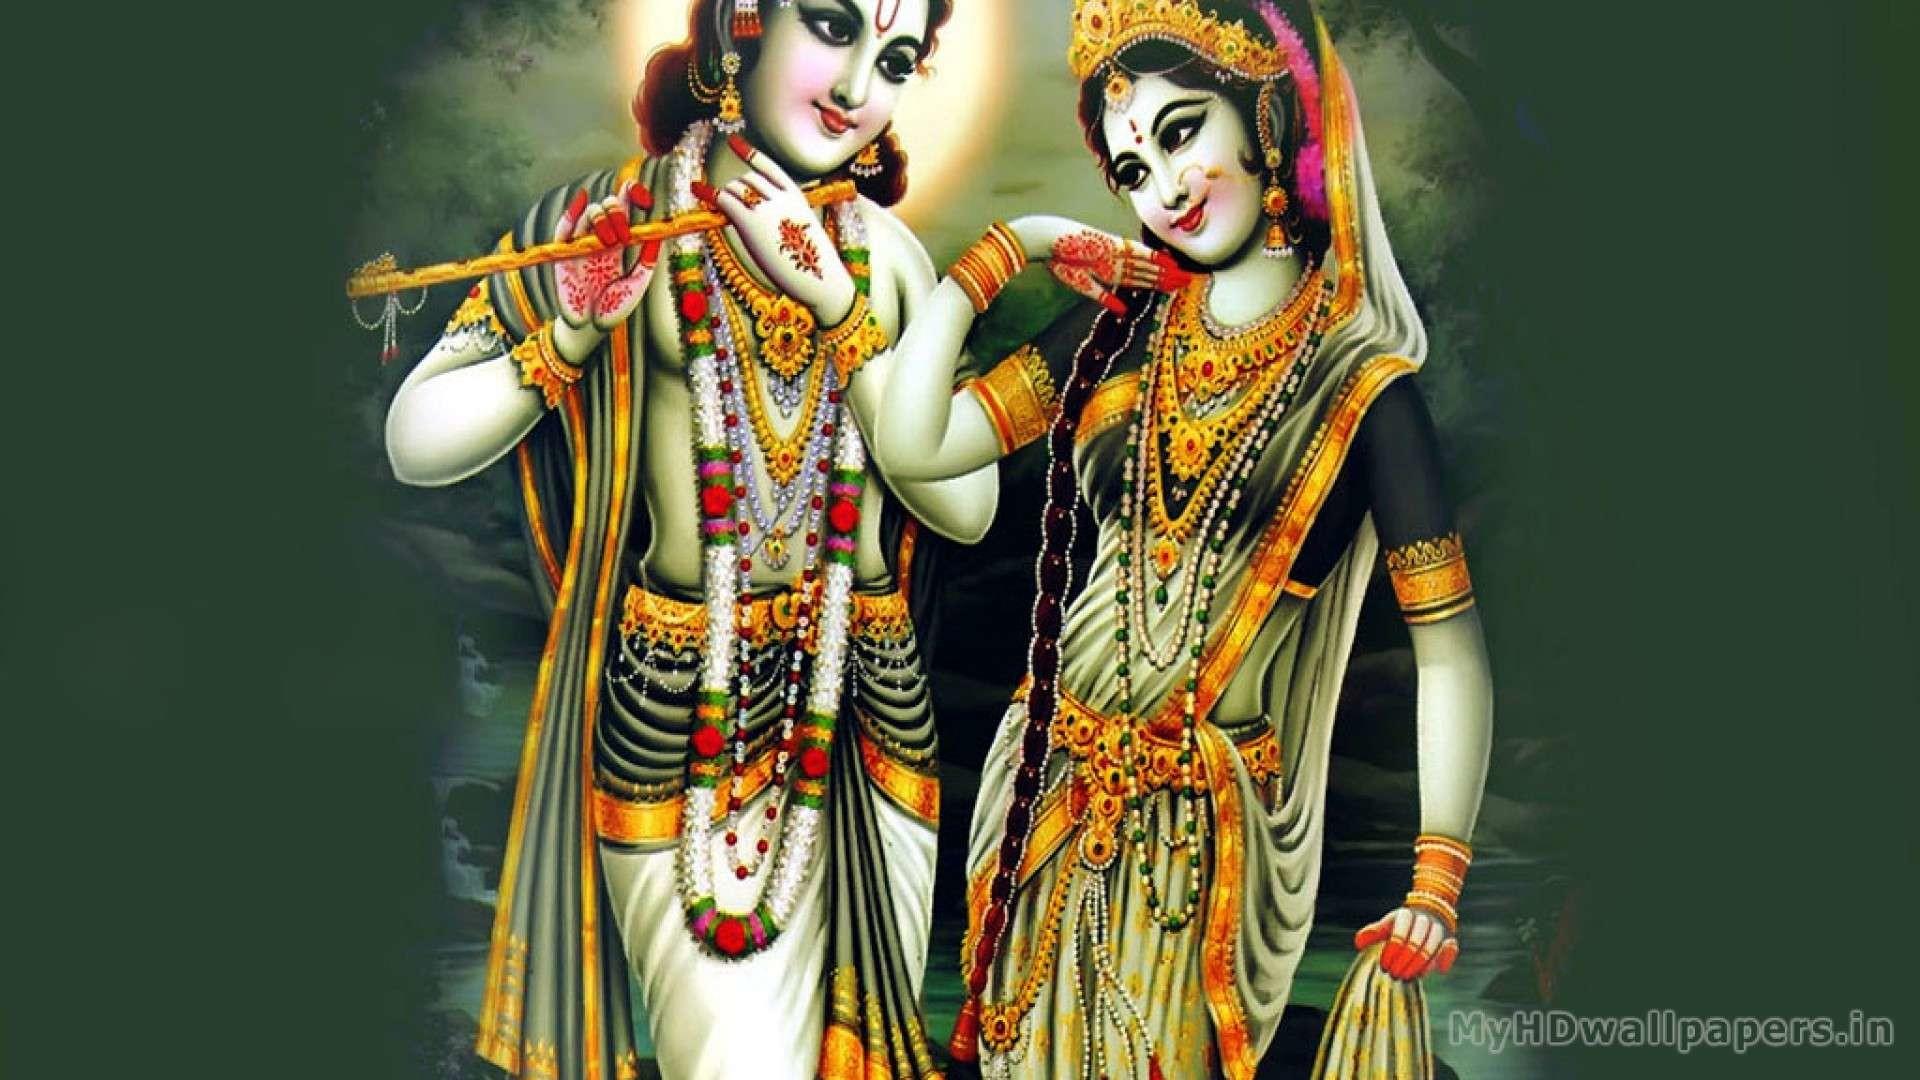 Lord Radha Krishna Desktop Wallpaper